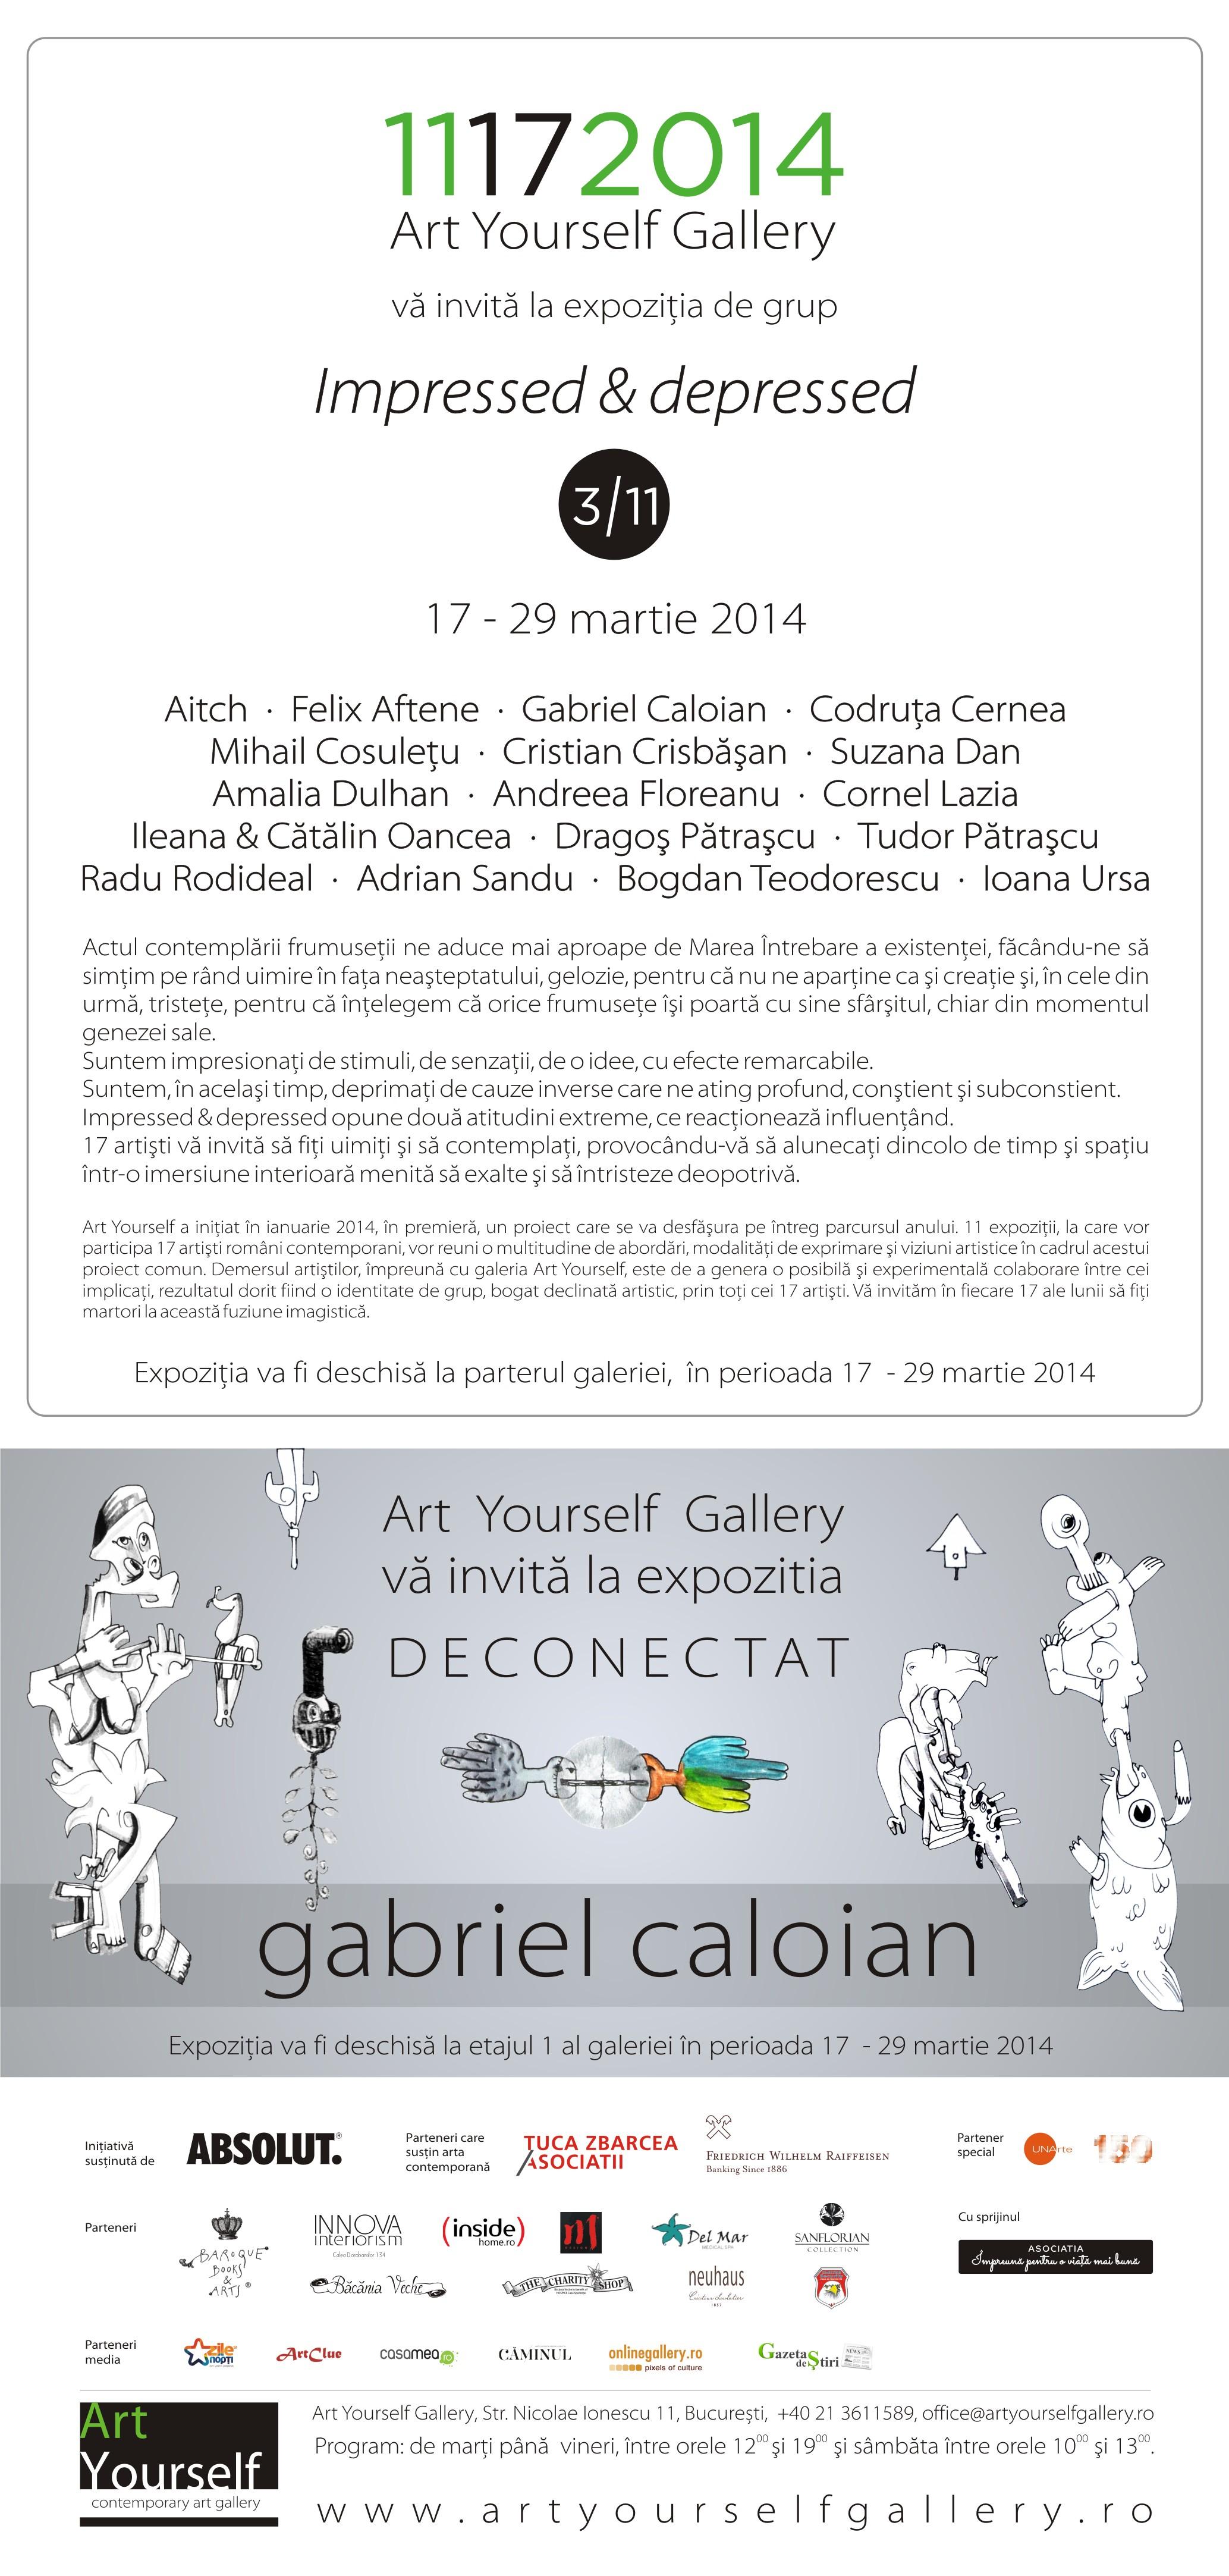 ArtYourself gallery - Impressed & Depressed